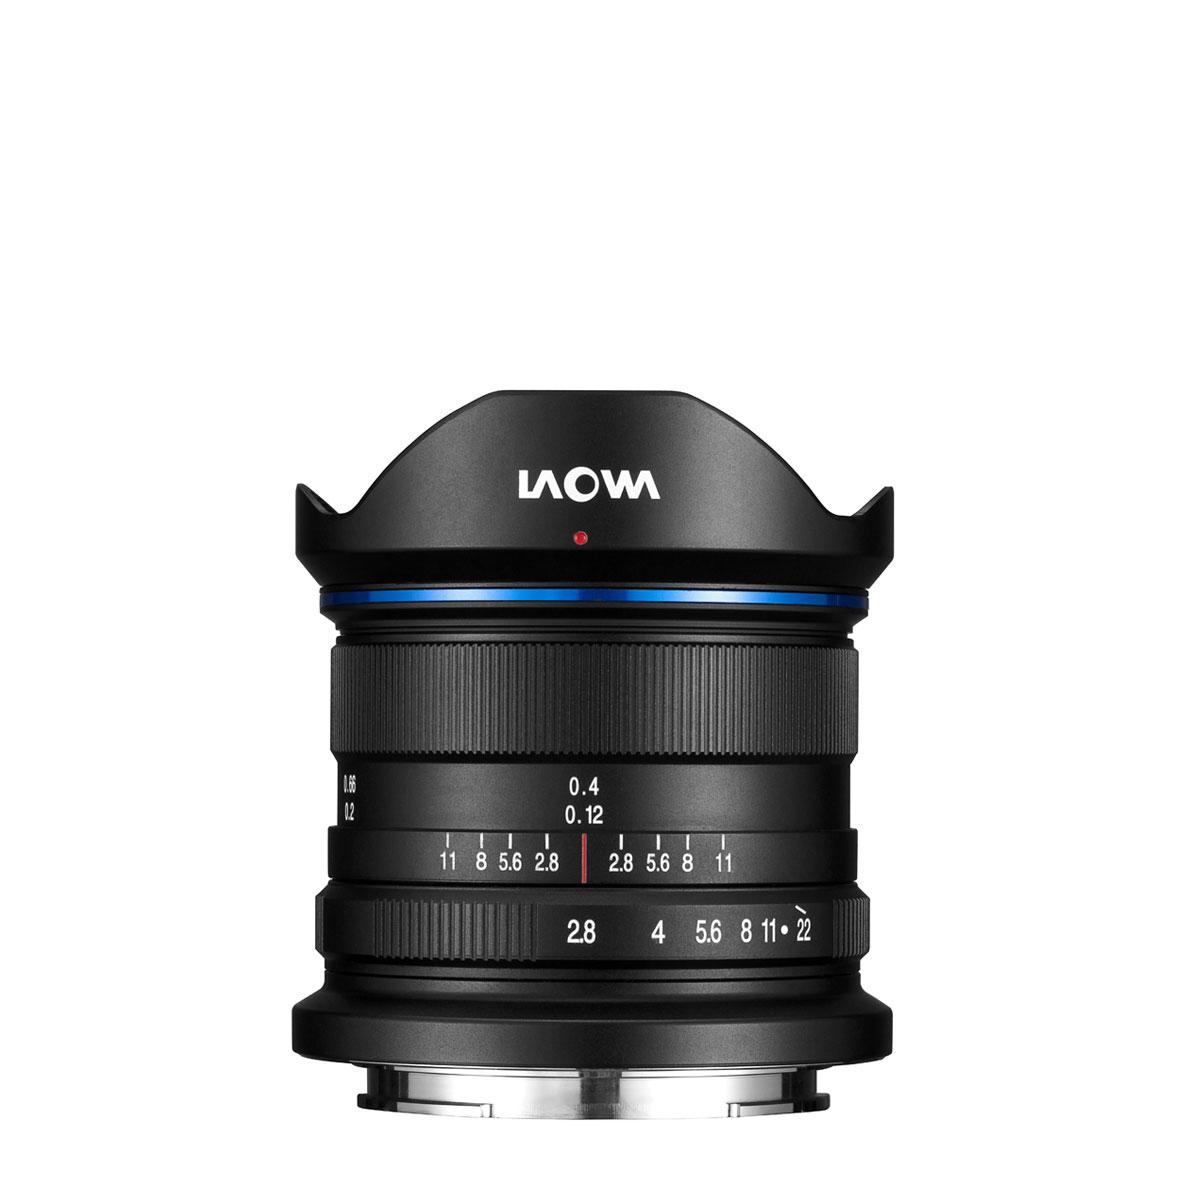 Laowa 9mm F2.8 Zero-D / Pre Order กำหนดการรับสินค้า : 9 เมษายน 2561 เป็นต้นไป